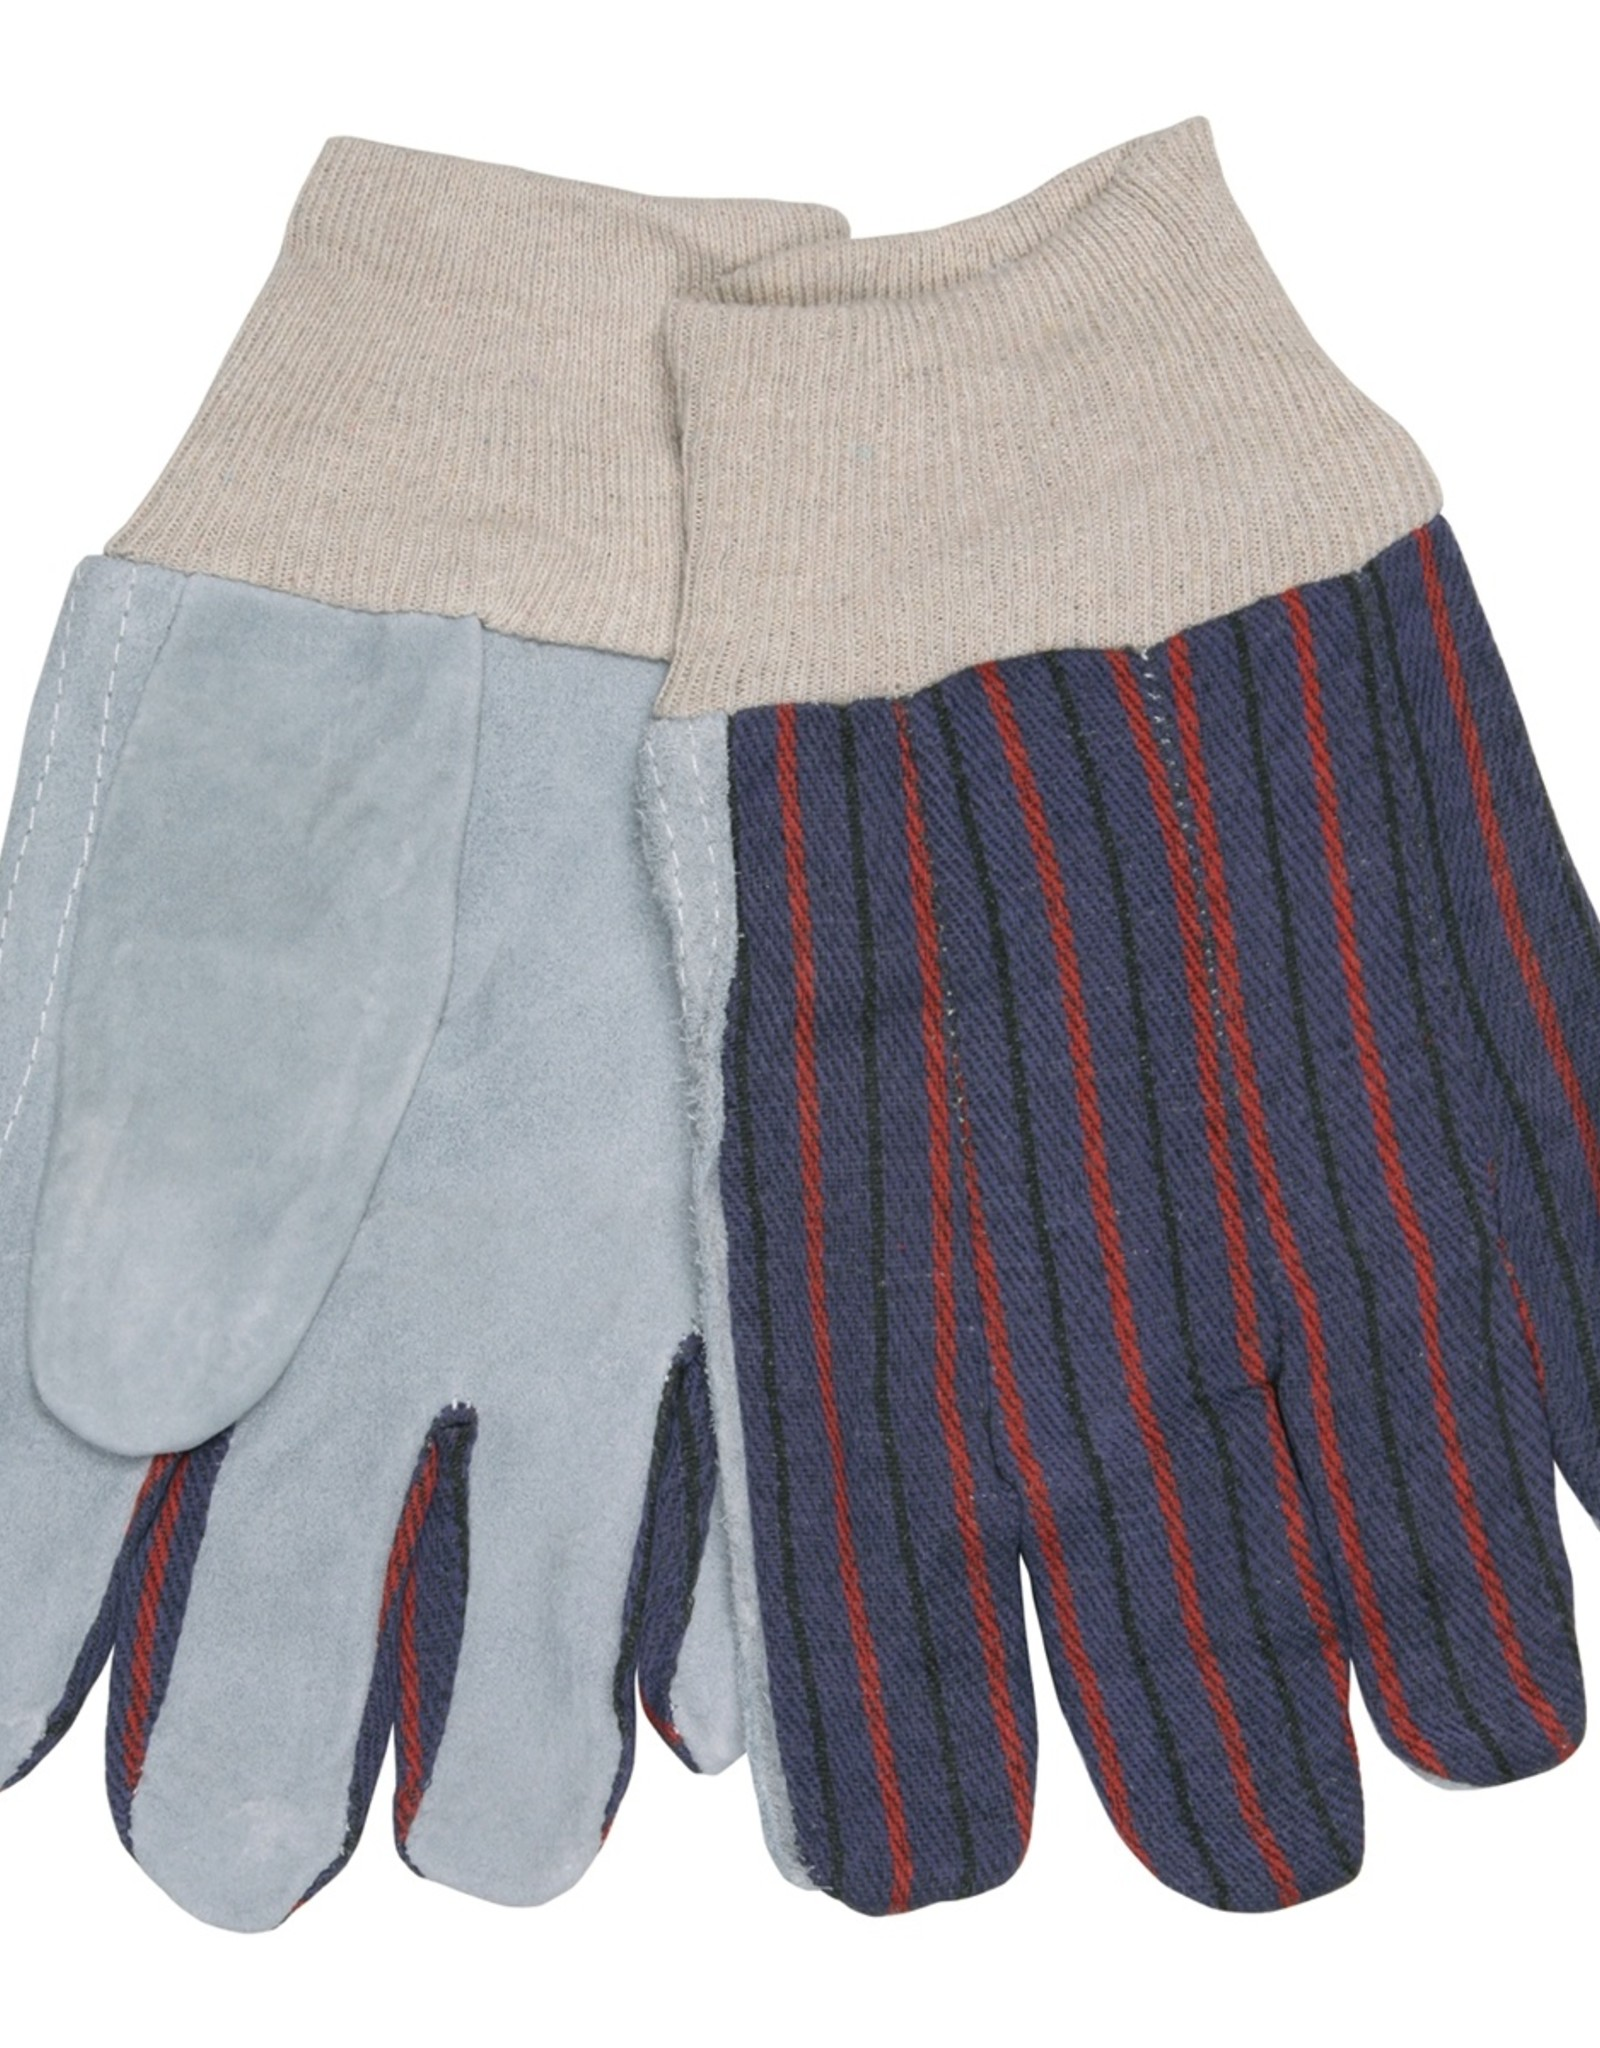 Seattle Economic Leather Palm Gloves, Knit Wrist